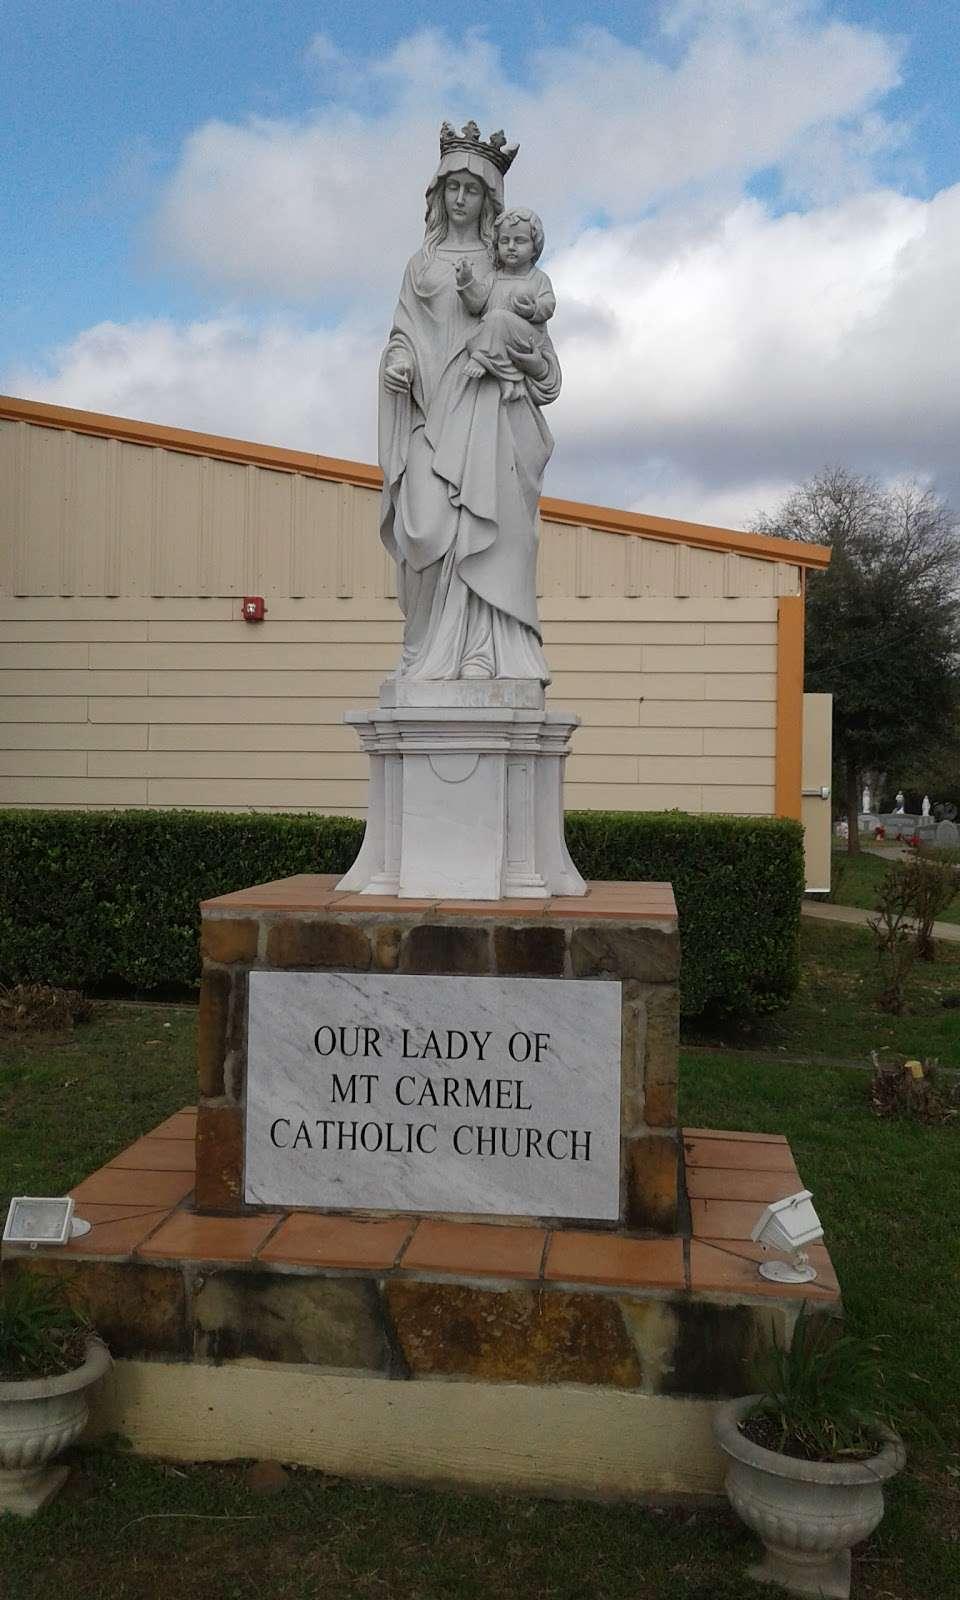 El Carmen Church - church  | Photo 7 of 9 | Address: 18555 Leal Rd, San Antonio, TX 78221, USA | Phone: (210) 626-2333